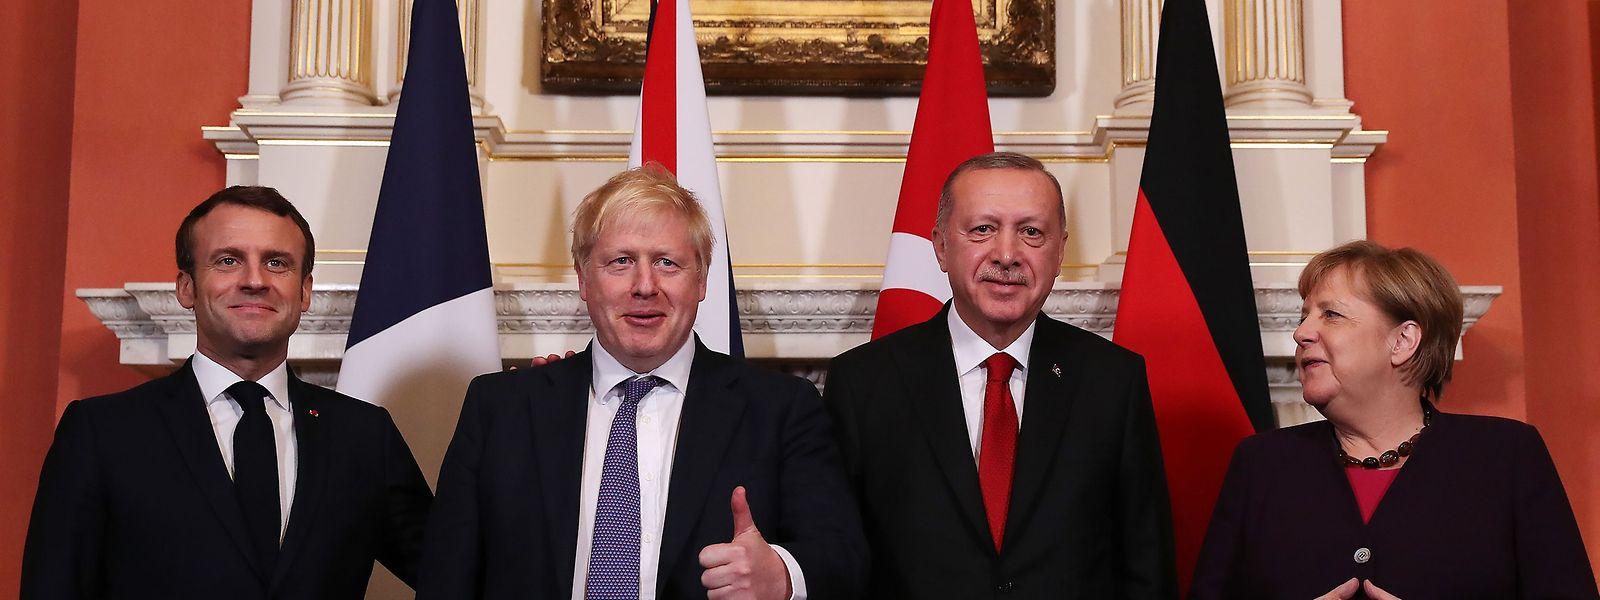 Emmanuel Macron, Boris Johnson, Recep Tayyip Erdogan et Angela Merkel (de g. à dr.)